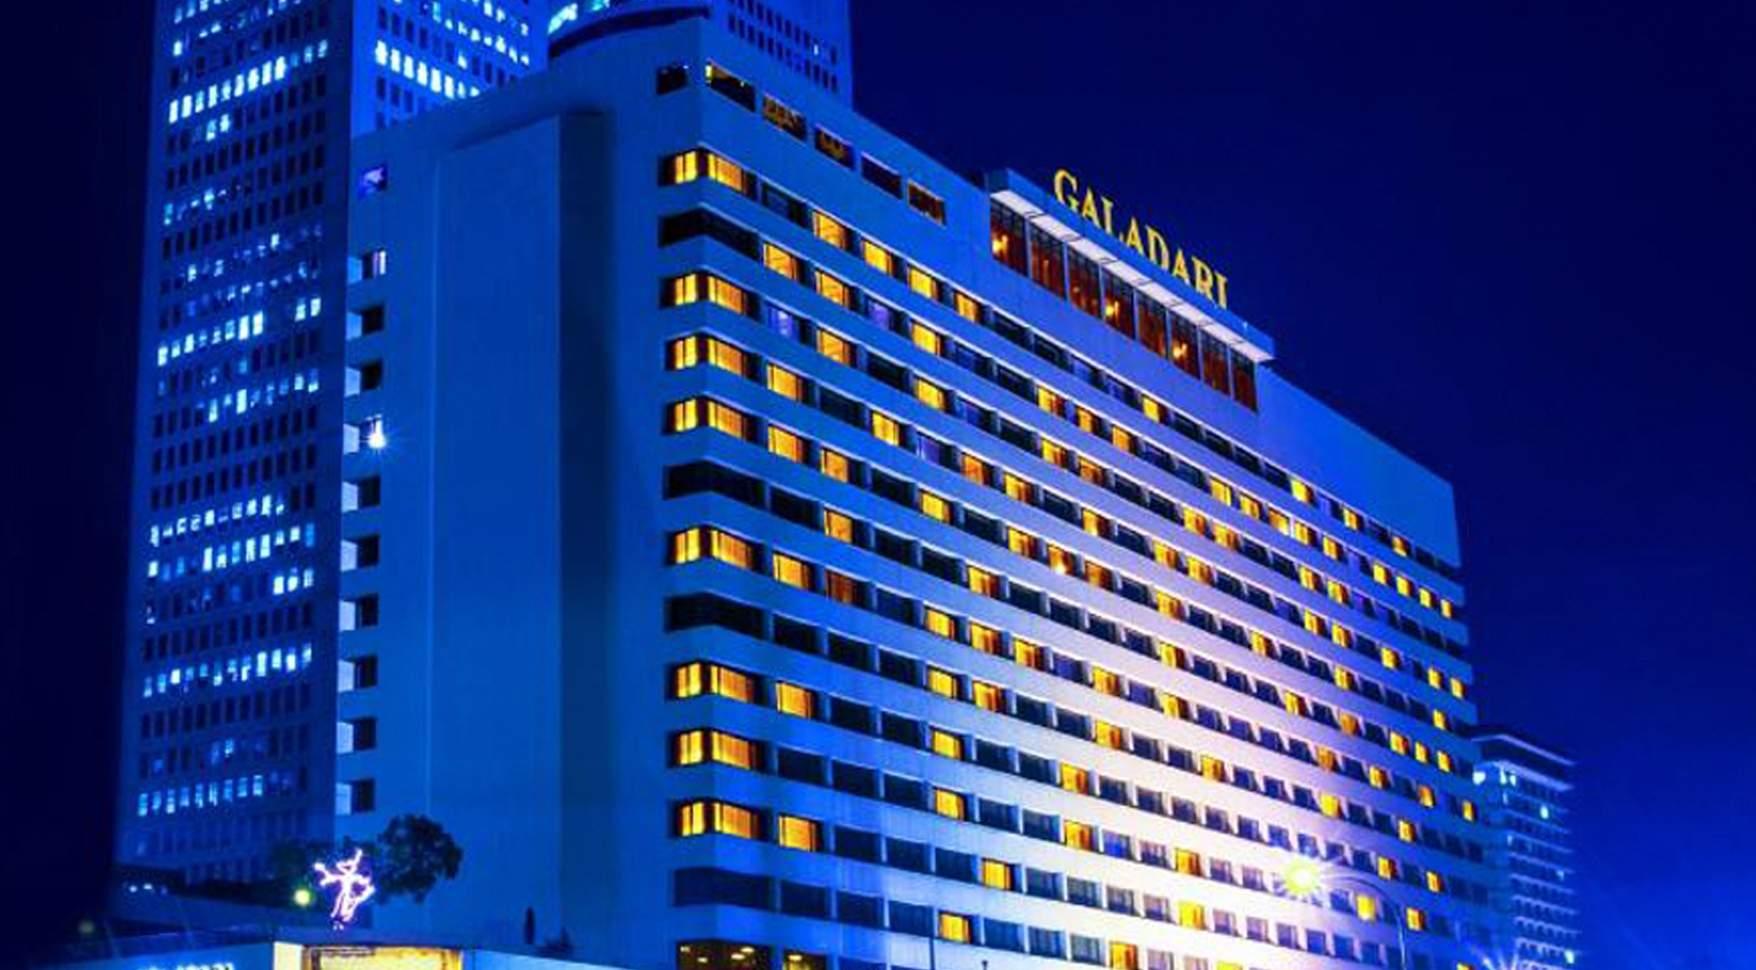 Hotel%20Galadari%20Colombo%20%20overview.jpg